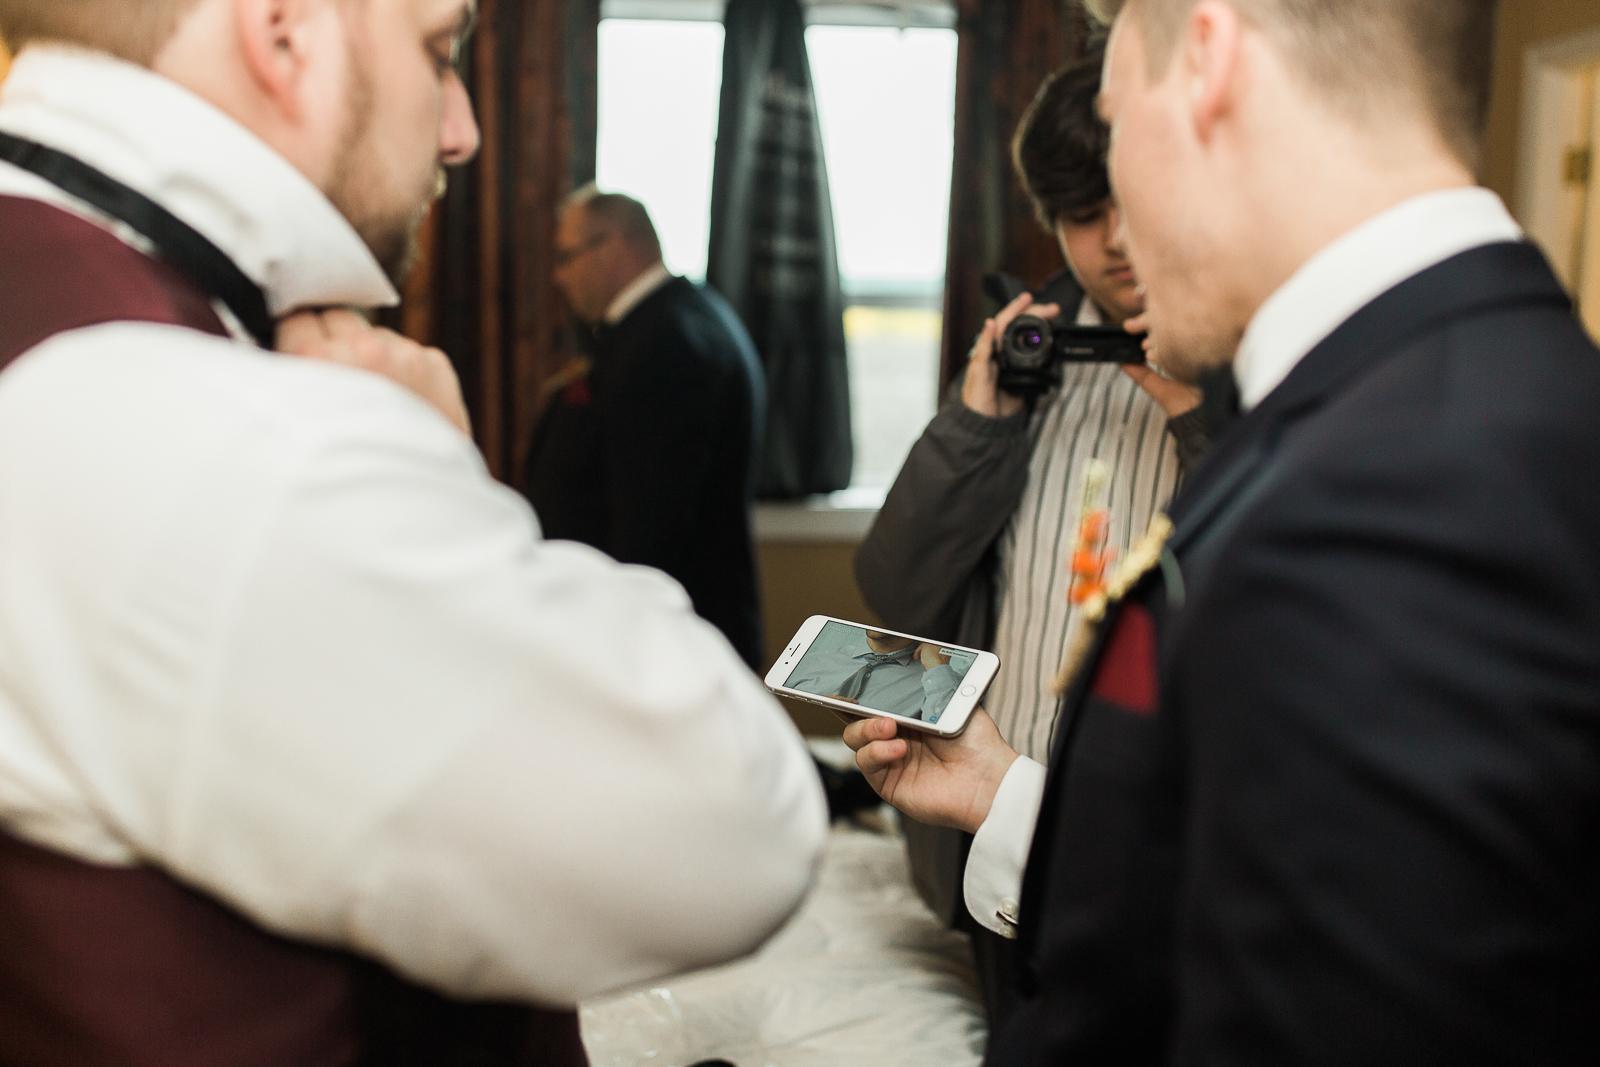 gander-wedding-photographer-11.jpg